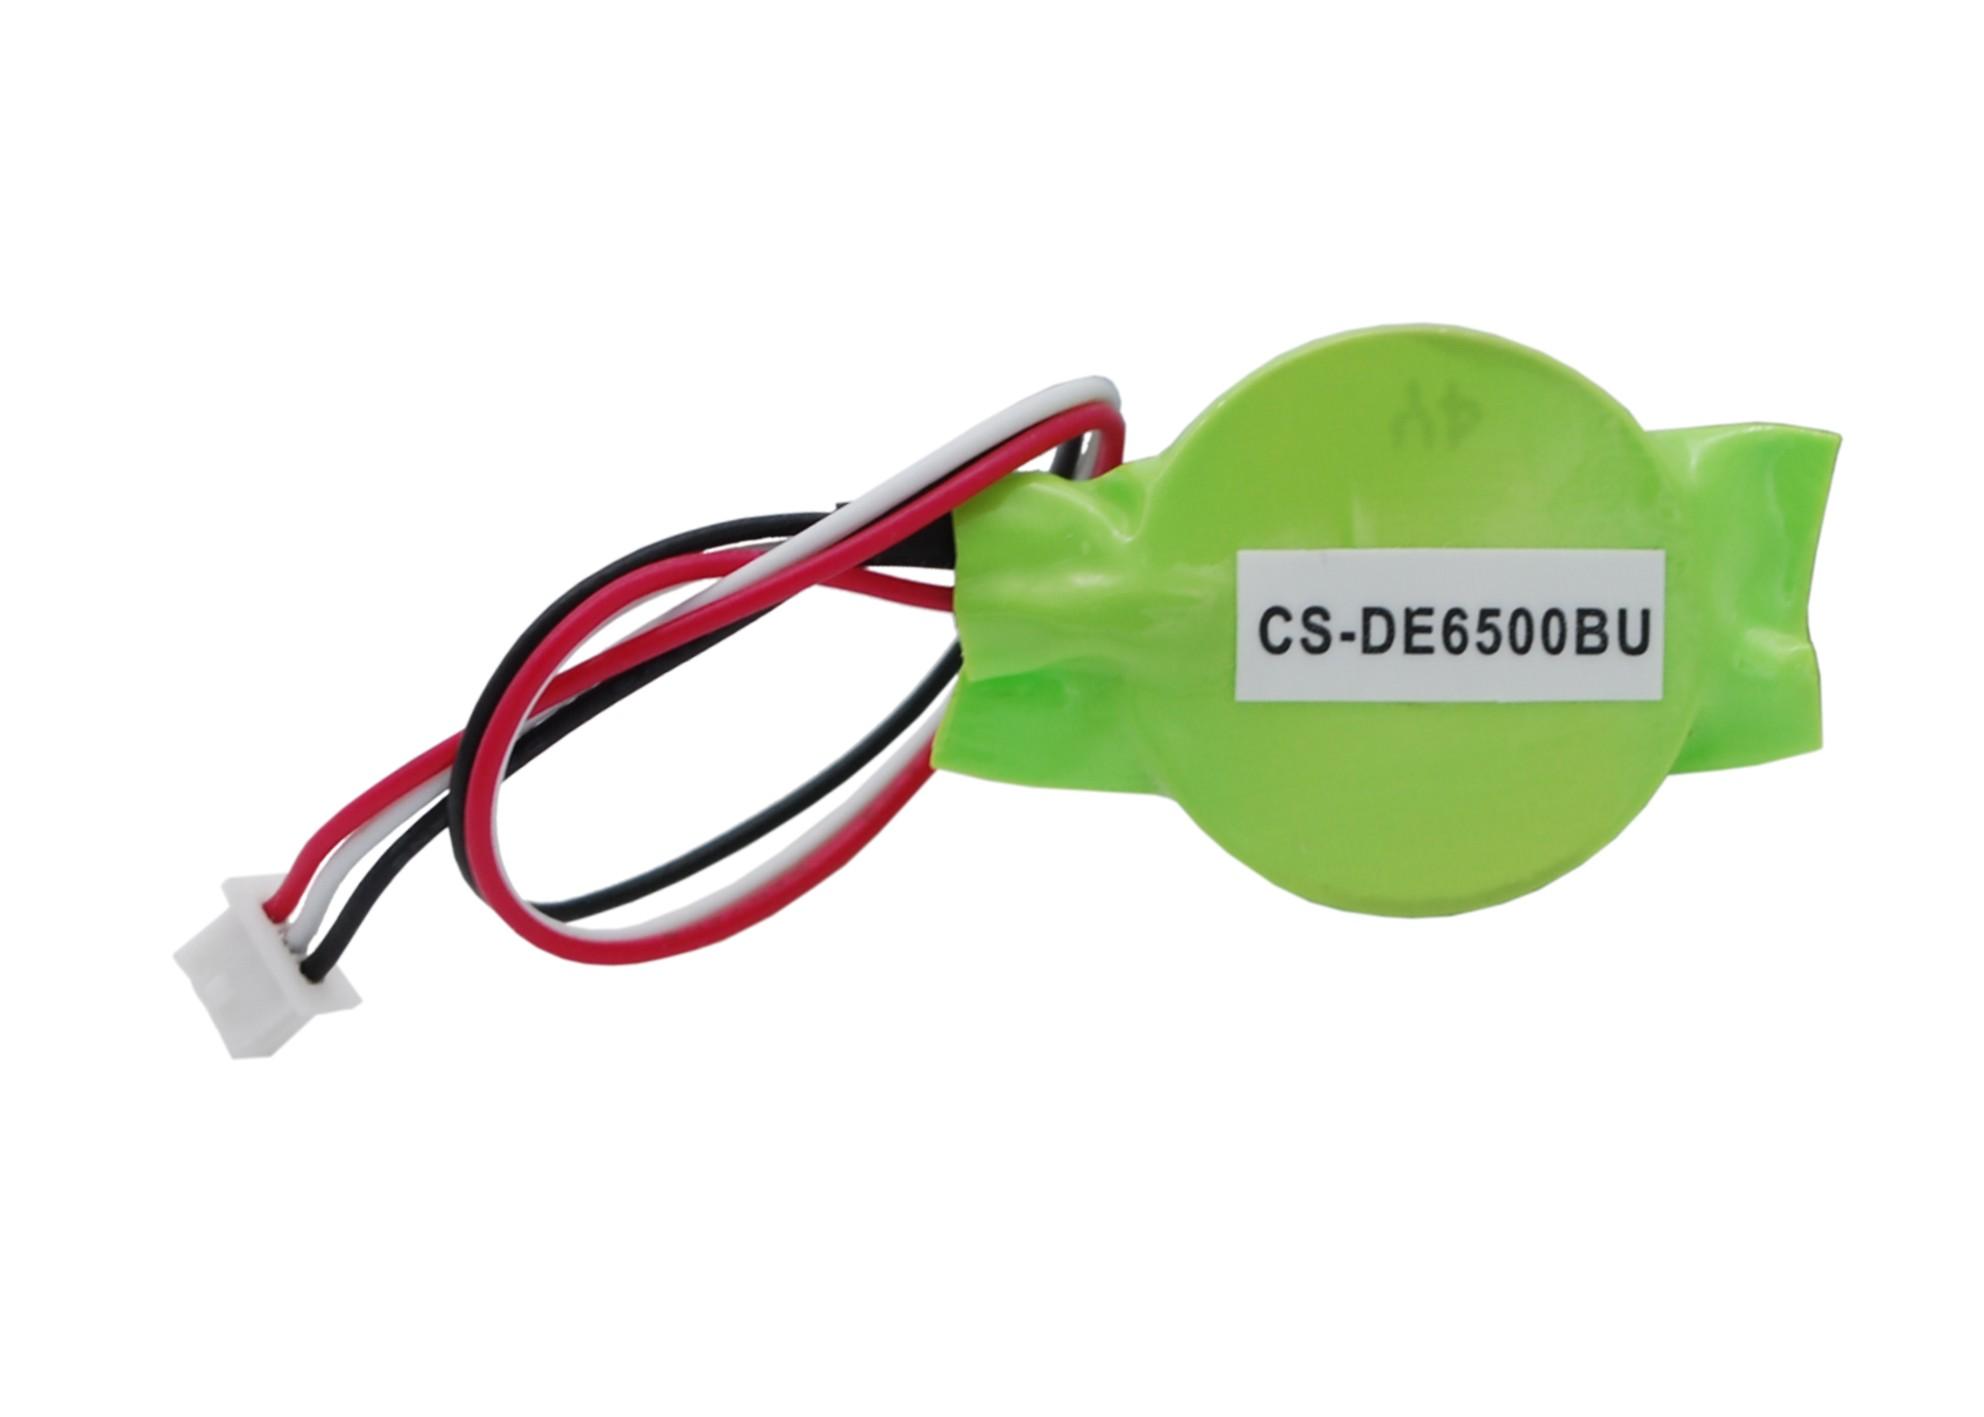 Cameron Sino baterie cmos pro DELL Latitude E6410 3V Li-ion 200mAh černá - neoriginální